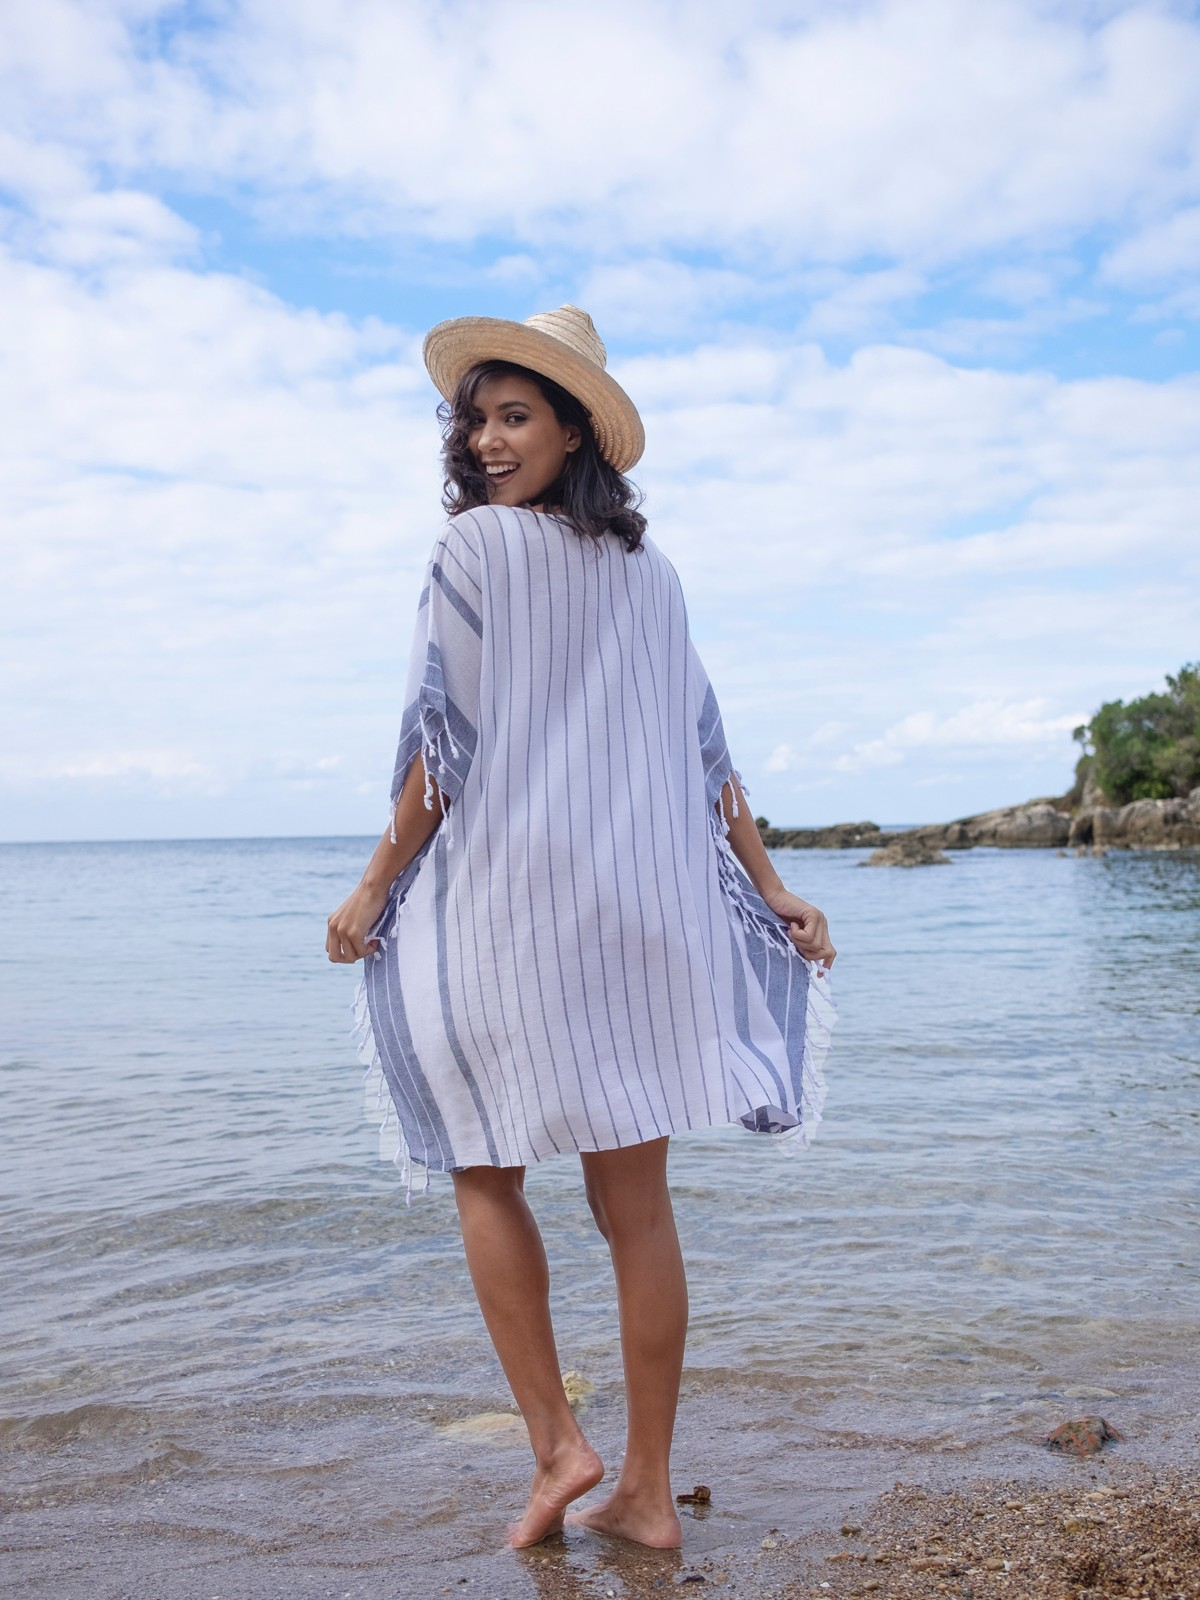 pacific-beach-dress2-1200x1600w